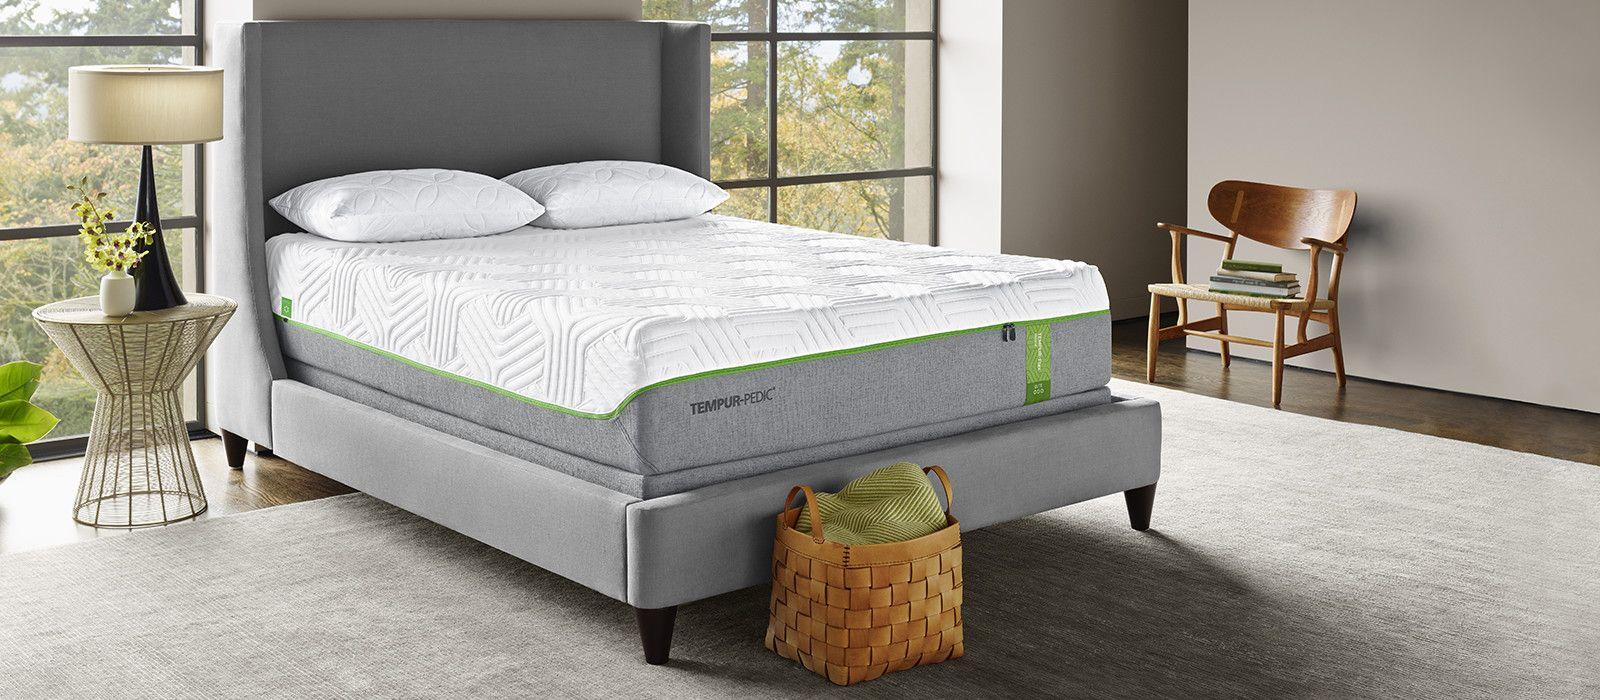 Closeout TEMPURFlex® Elite Tempurpedic mattress